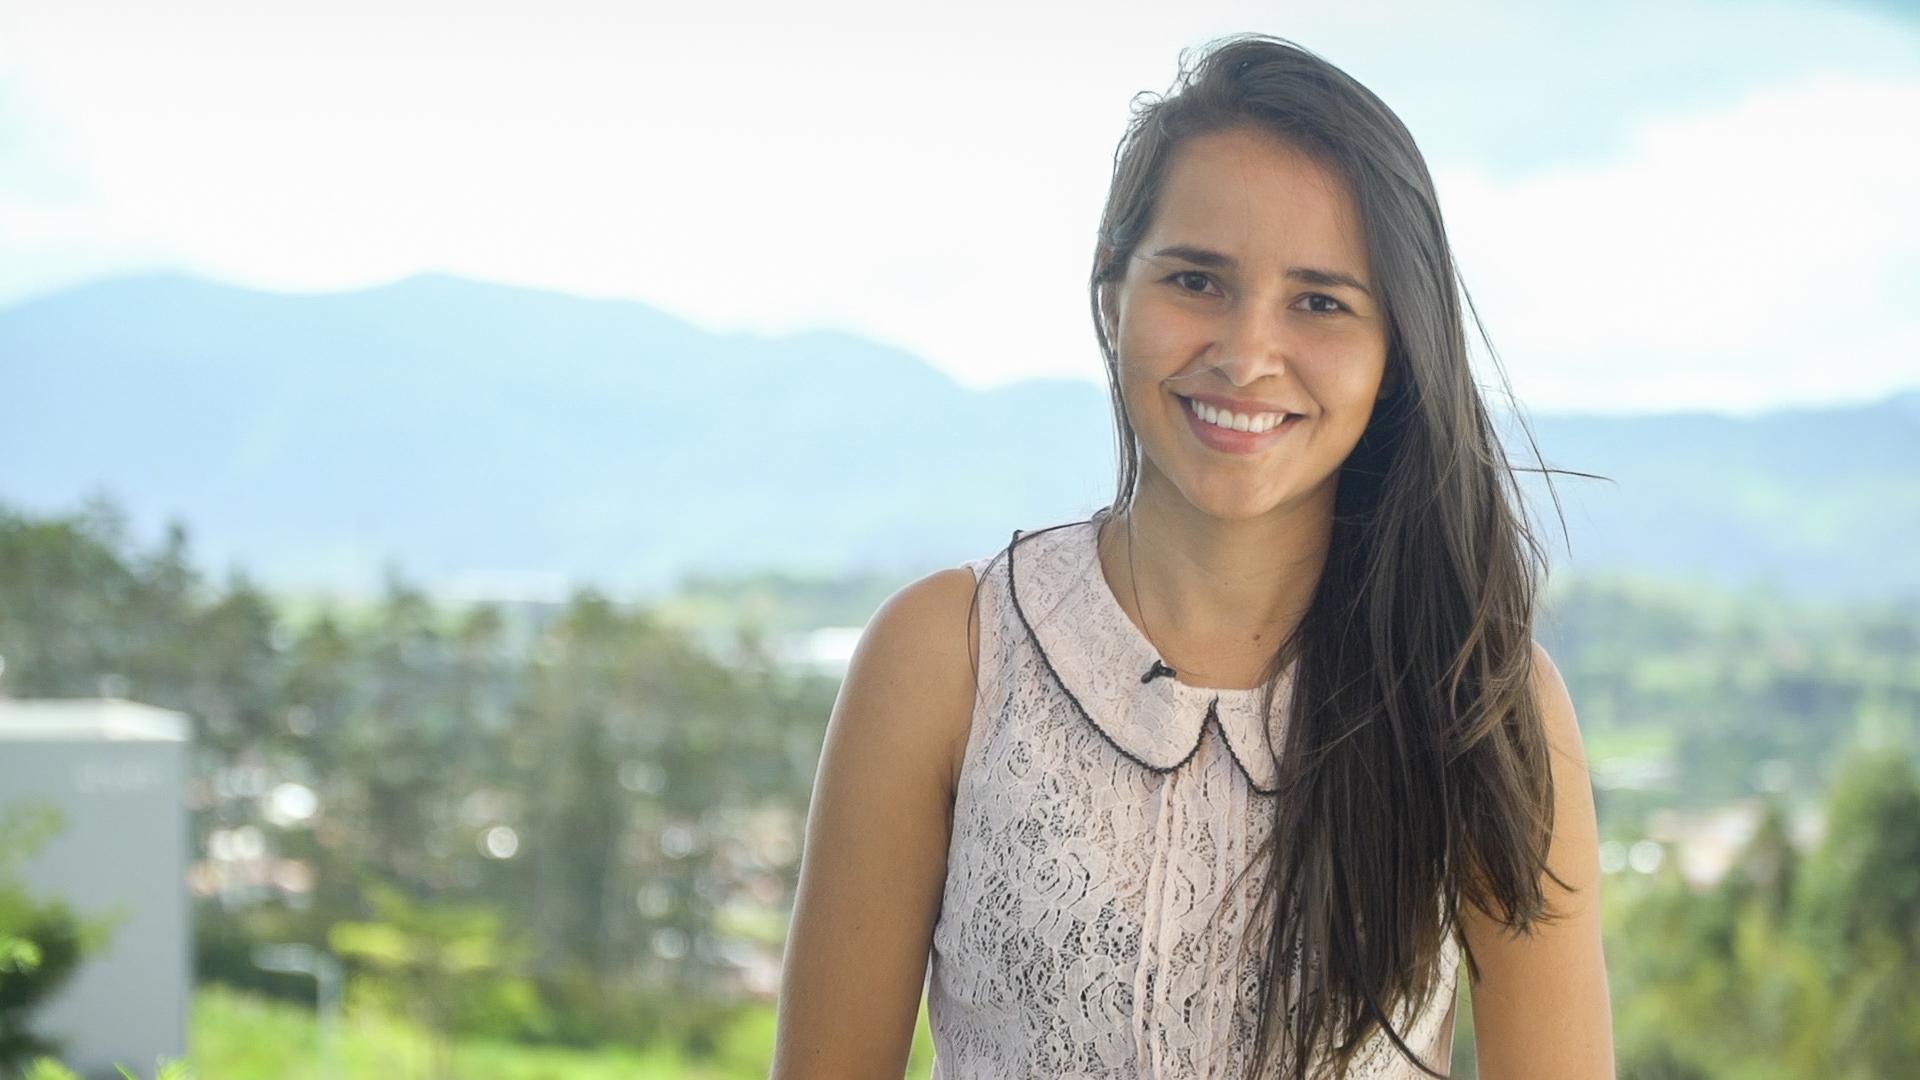 Lic. Alina Rodríguez